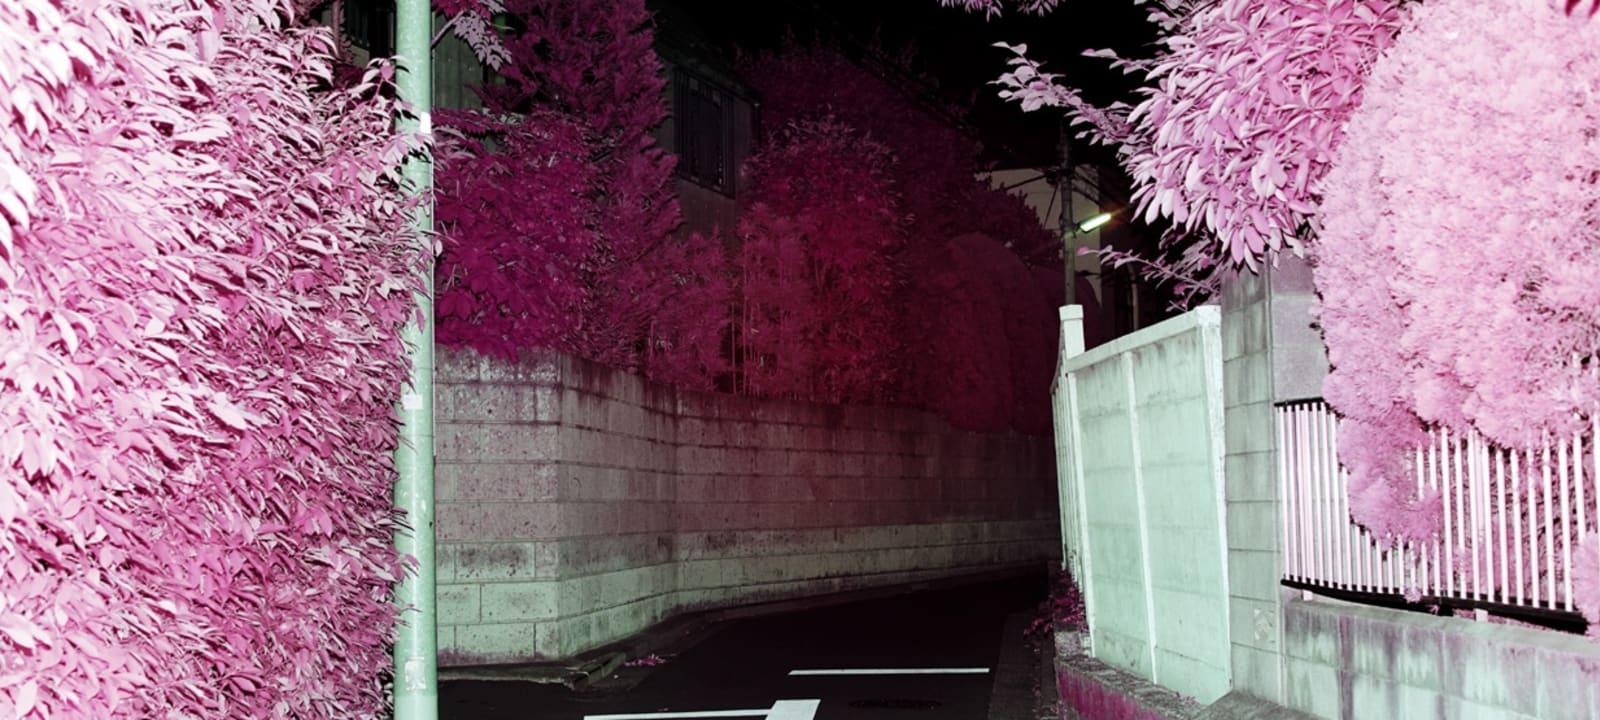 pathway at night